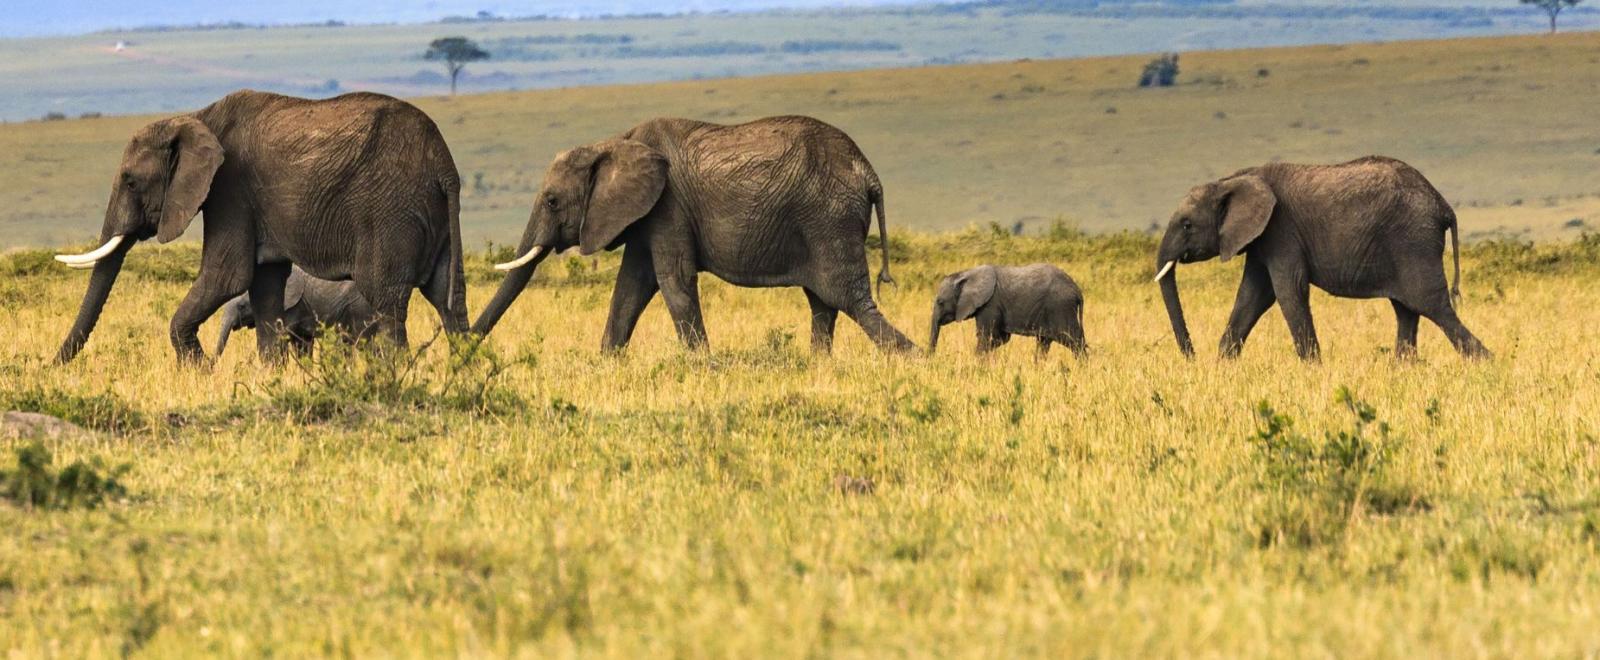 Elephant family roaming through the wilderness of Botswana in Africa